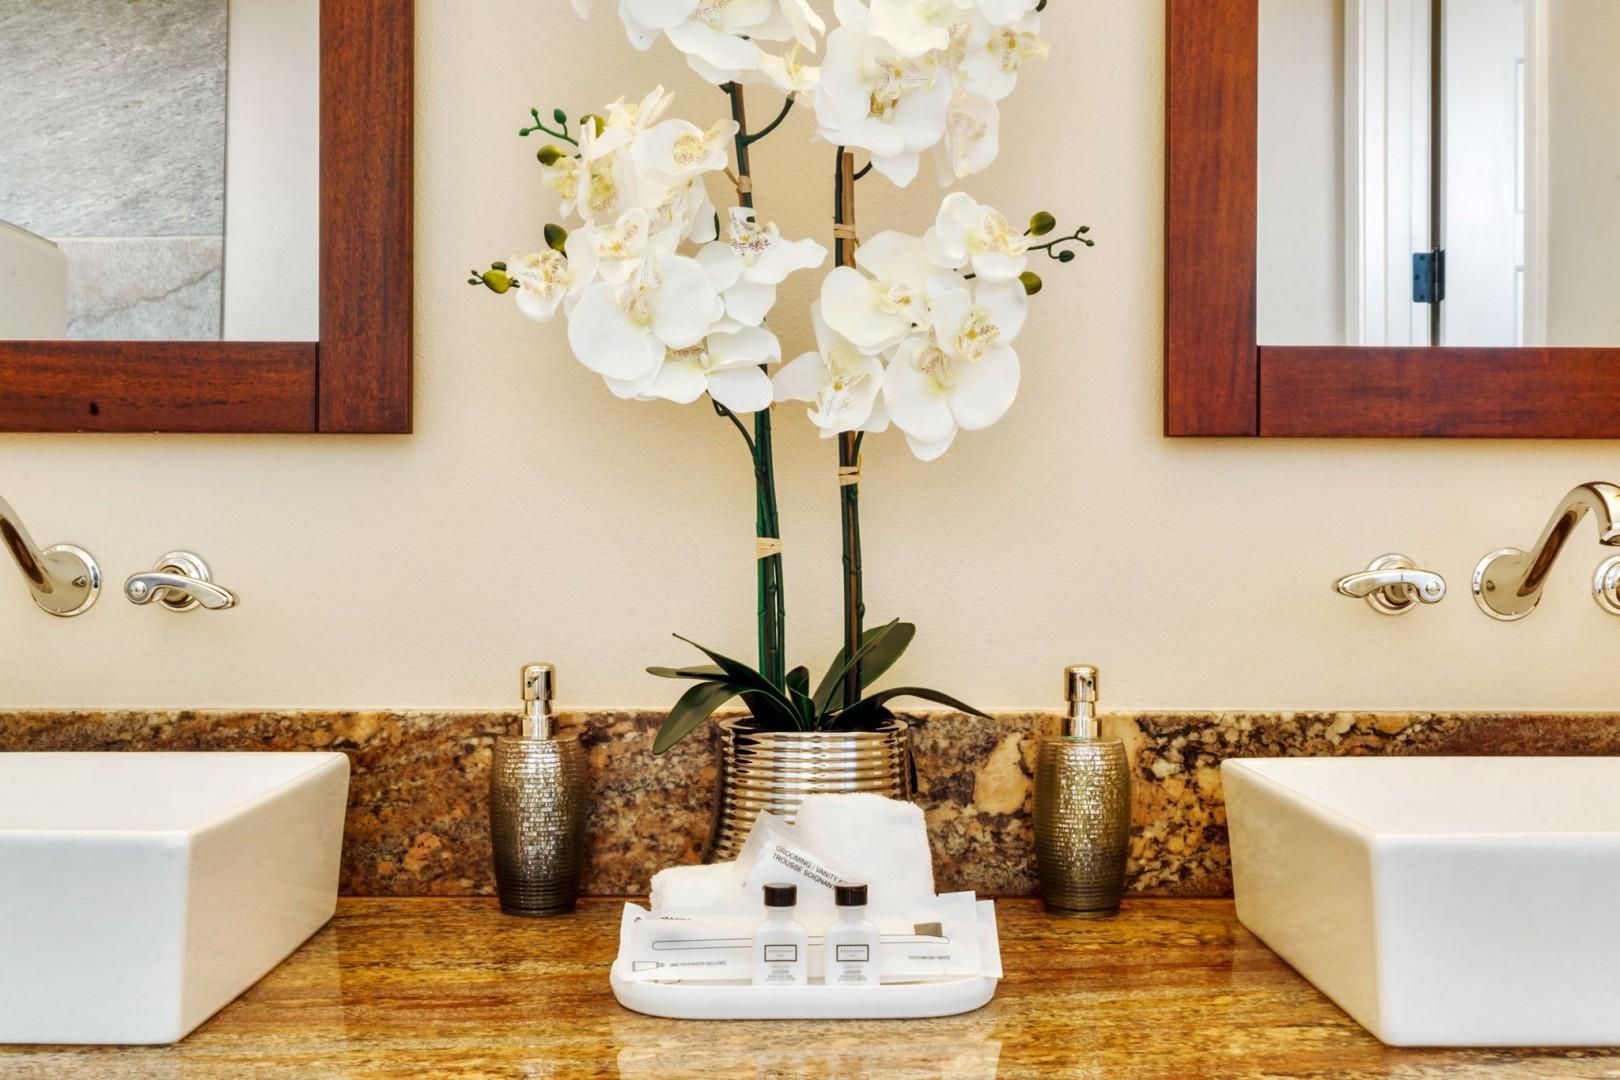 Luxury amenities provided